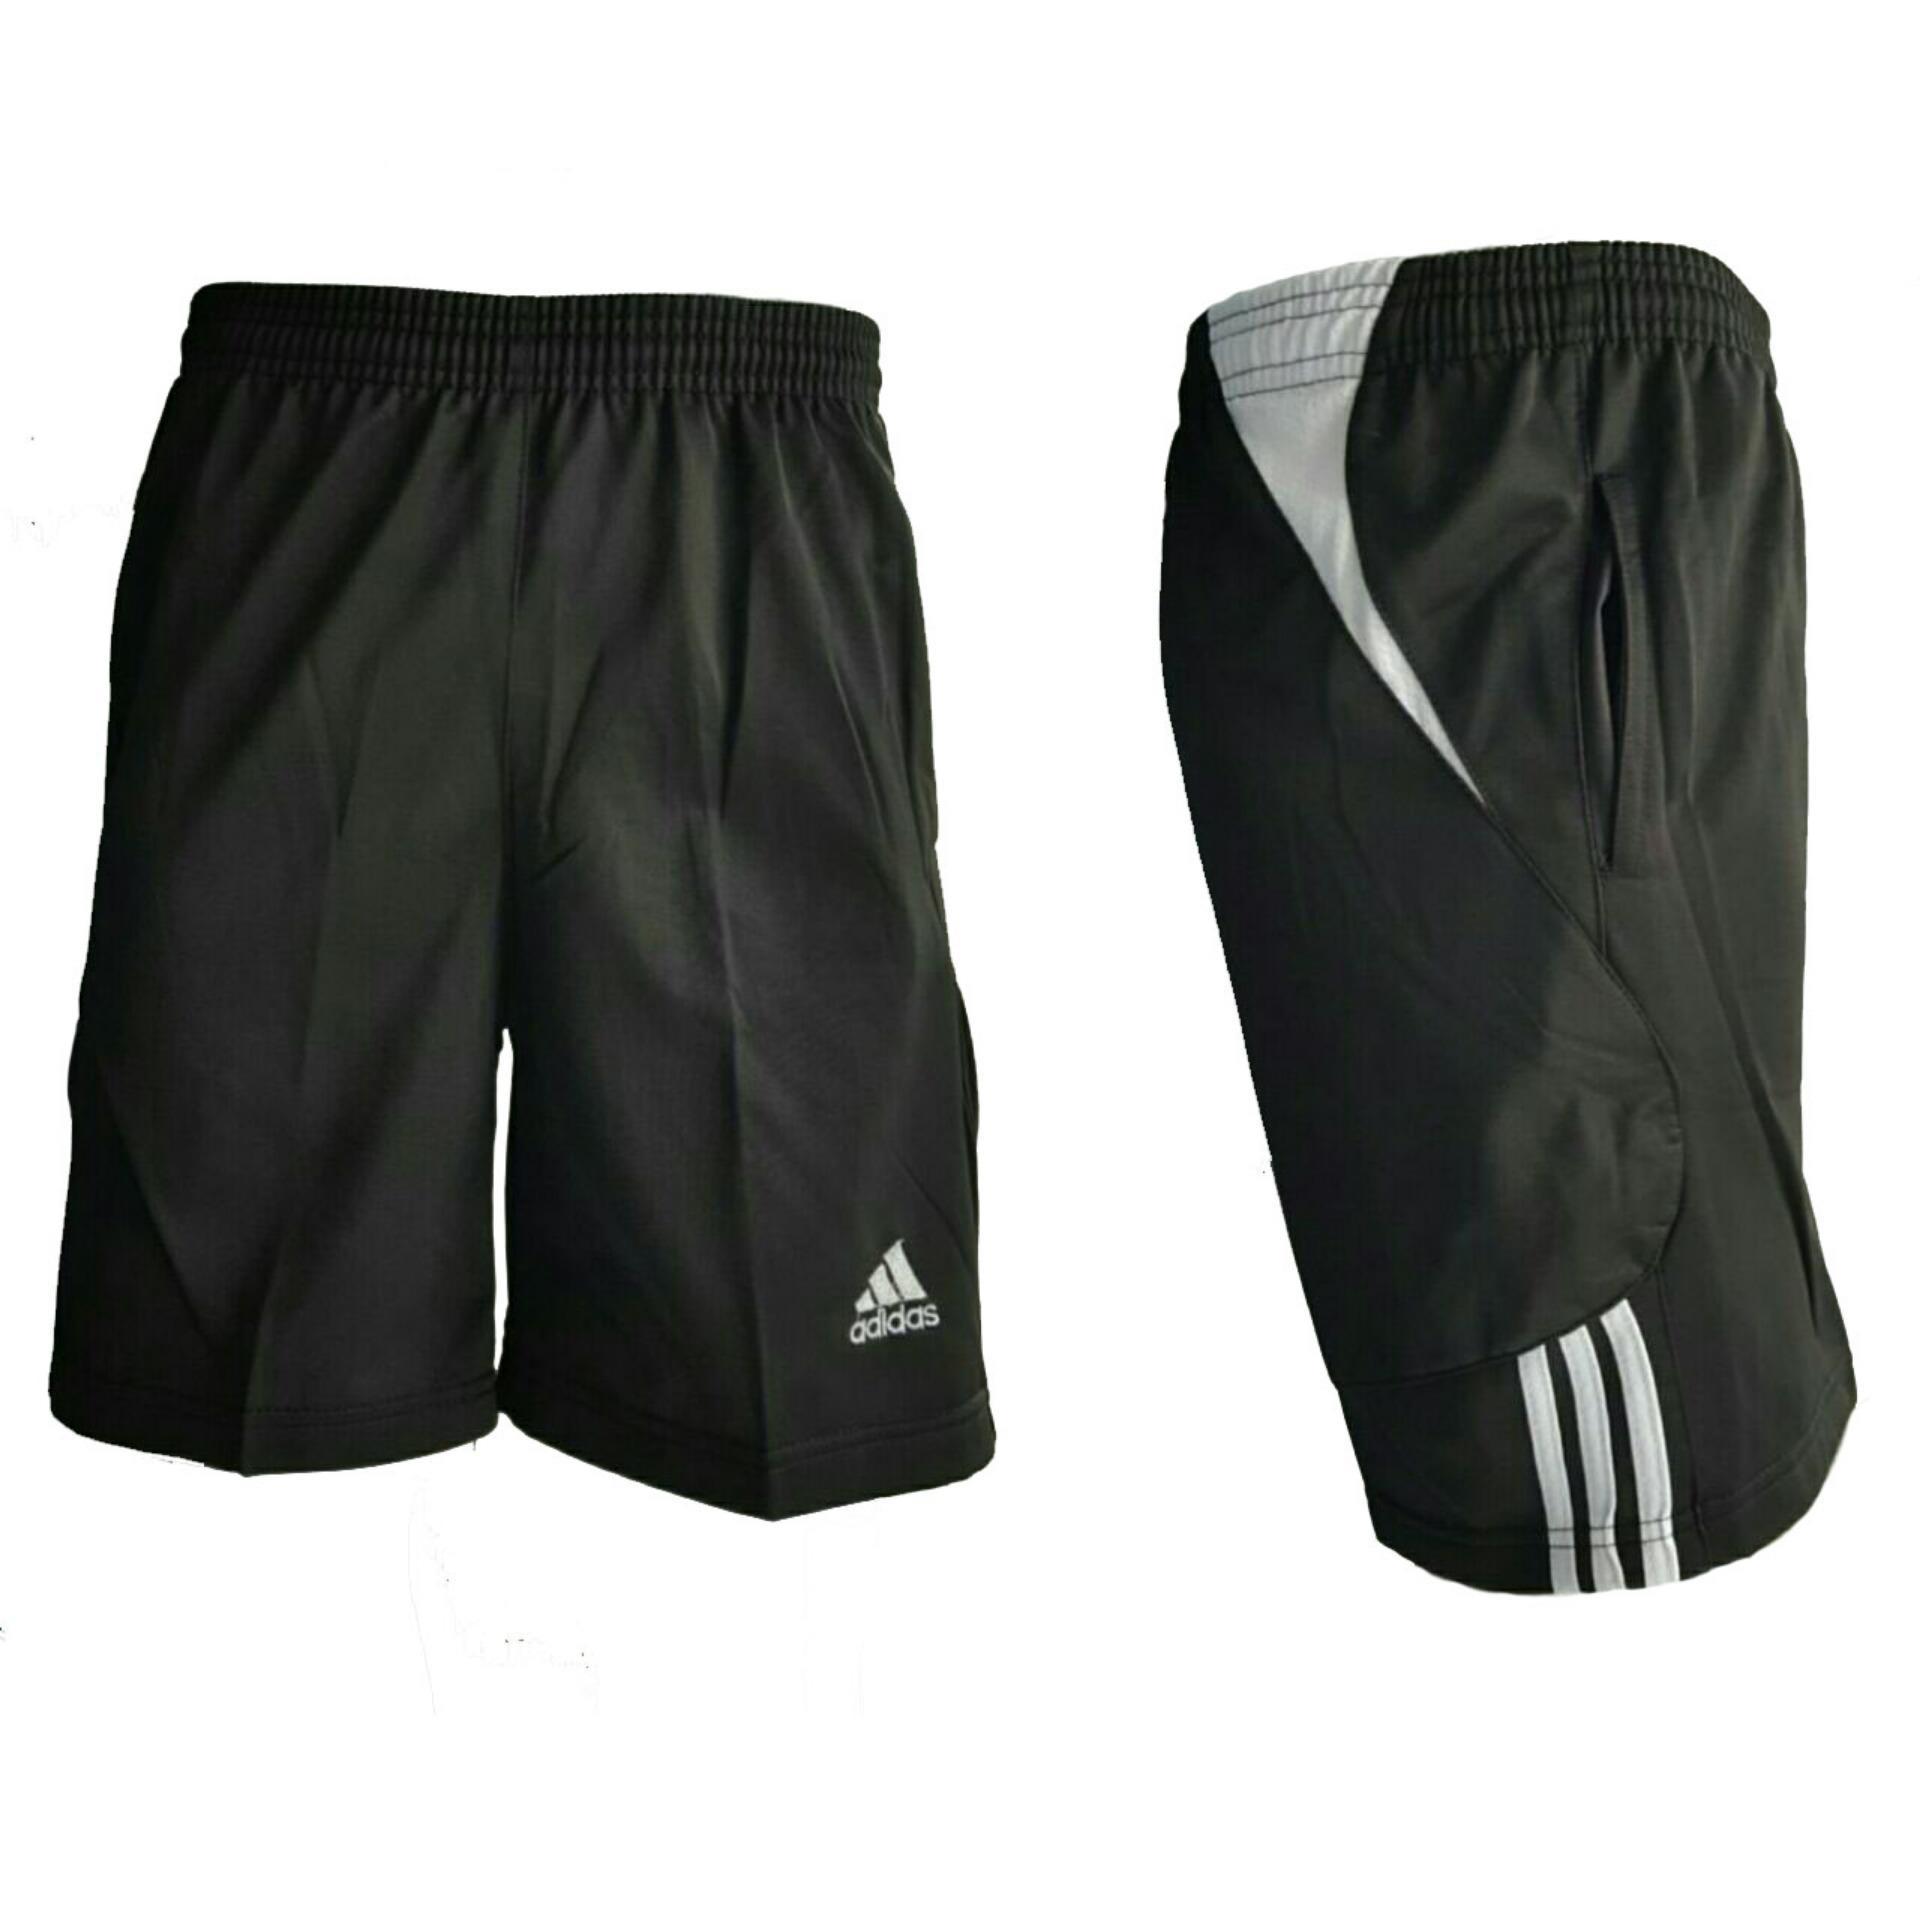 Celana Olahraga - Celana Pendek - Celana Badminthon, Tennis, Running, Volly, Futsal, Sepakbola